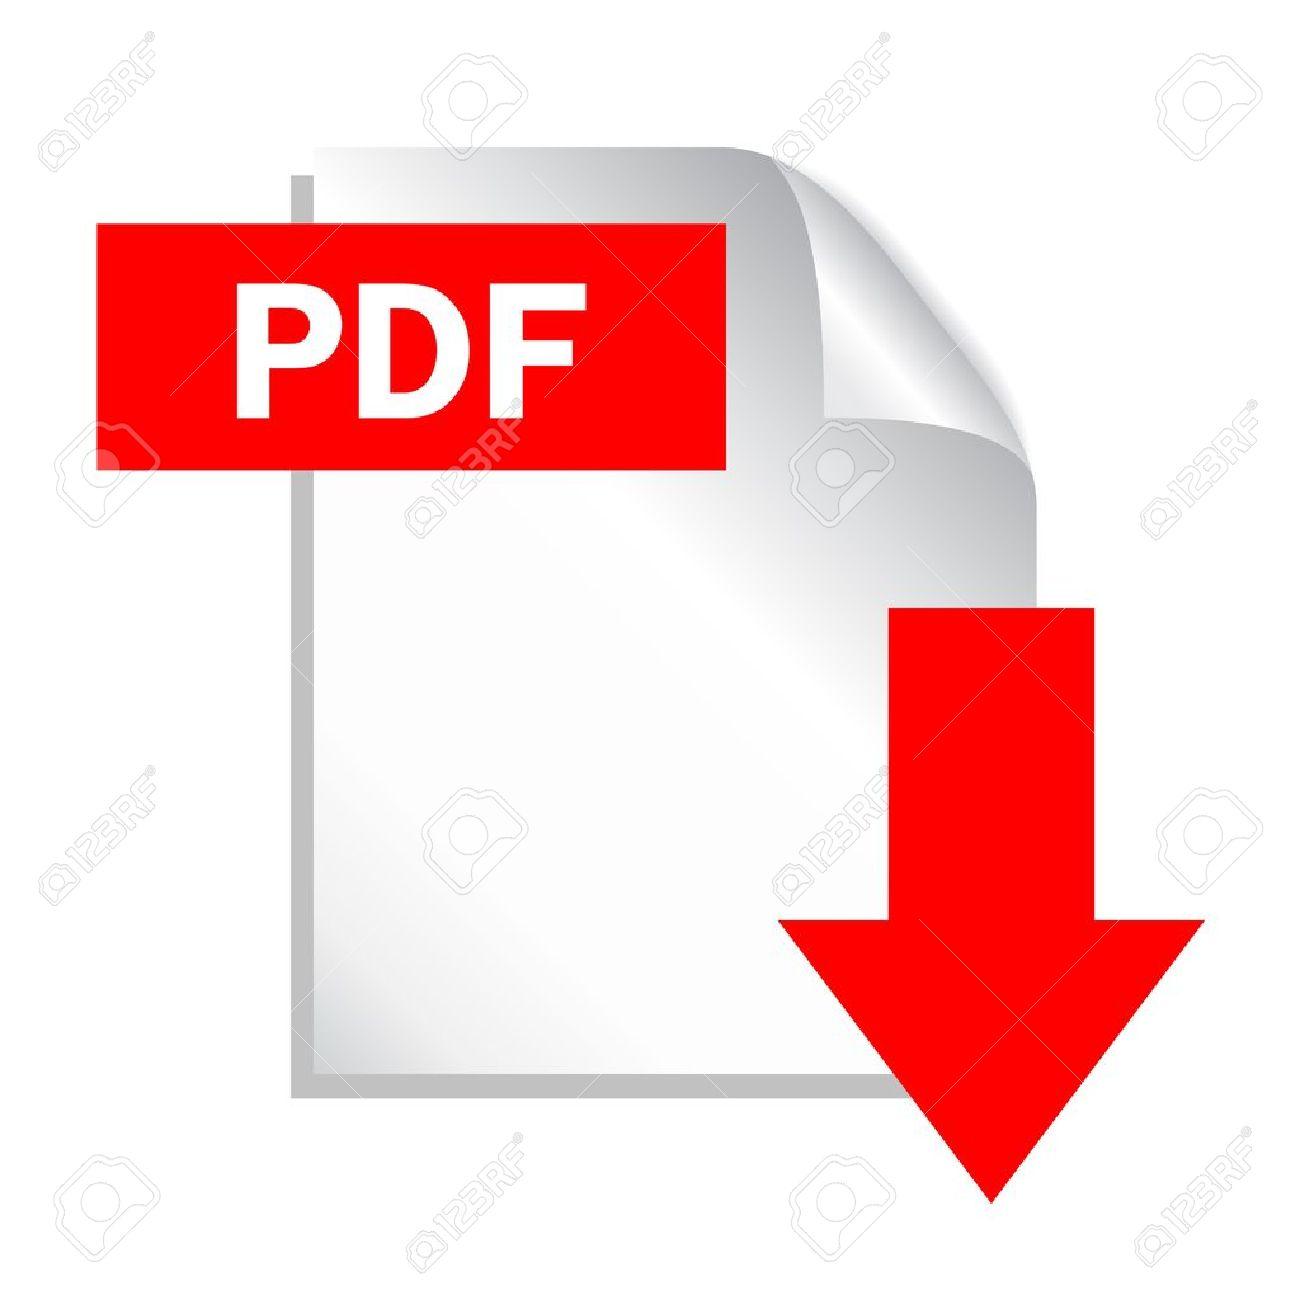 Pdf файл скачать значок. Документ текста, символ web. Значок.